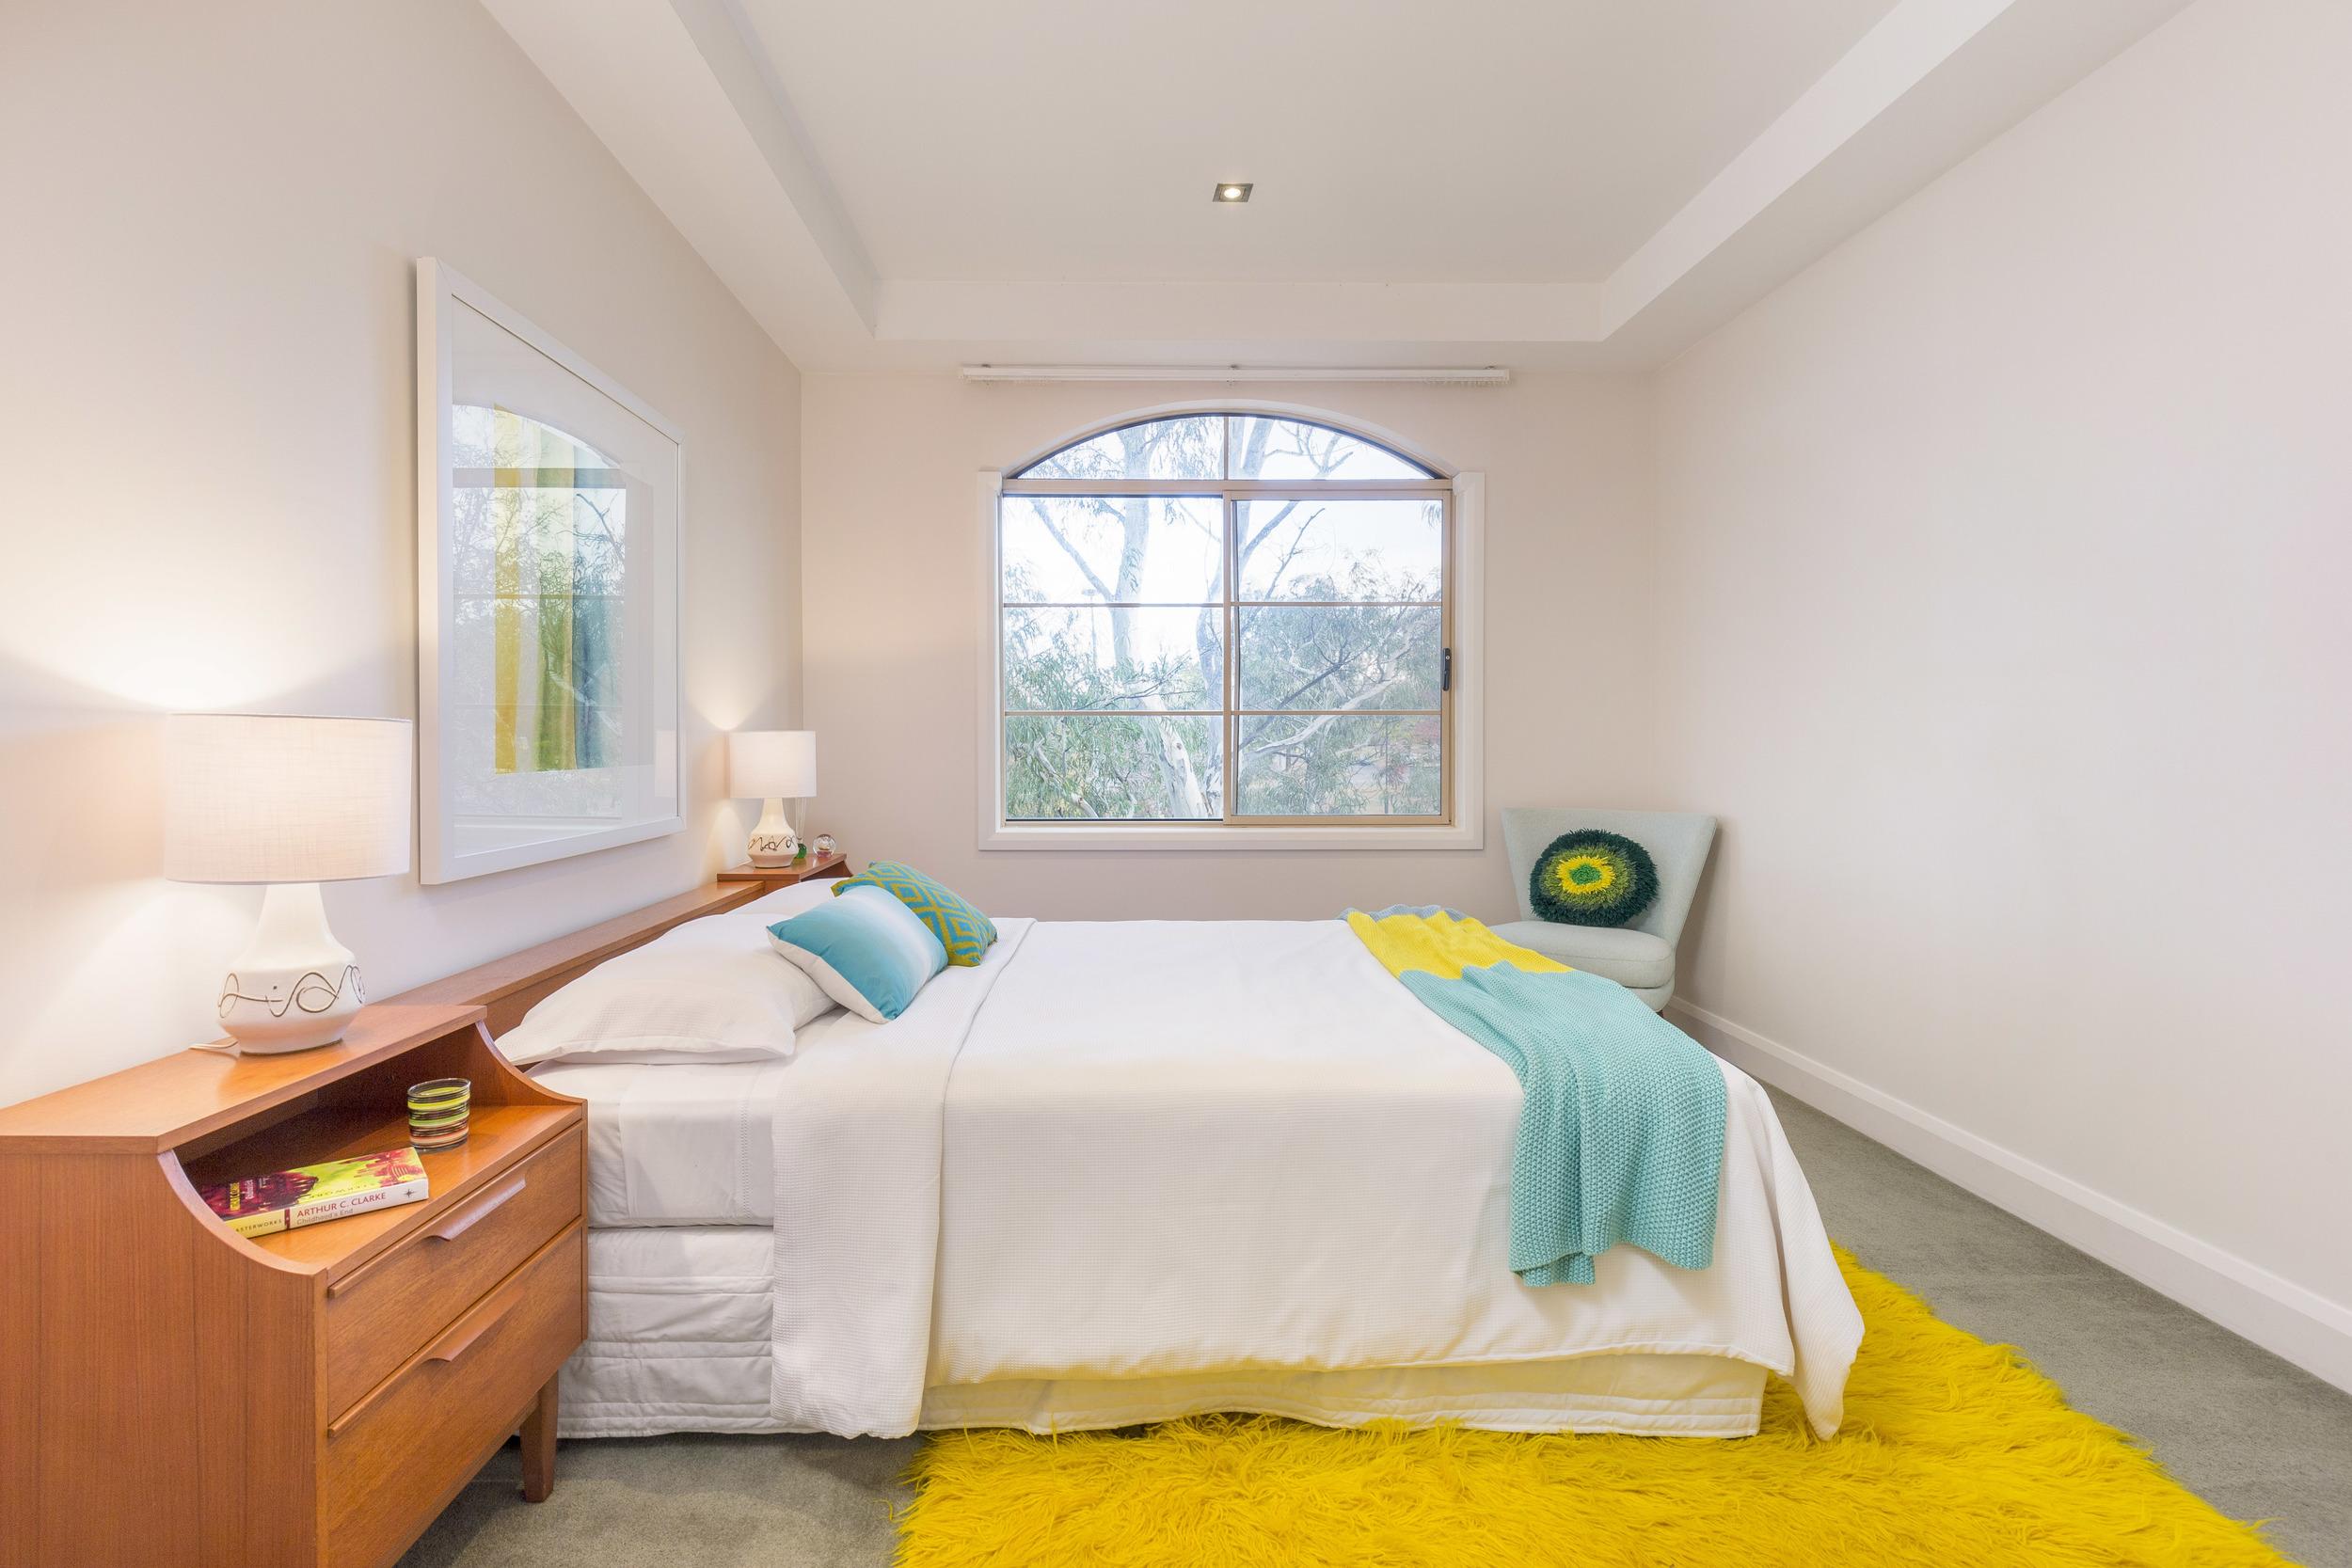 sophie main bed after.jpg